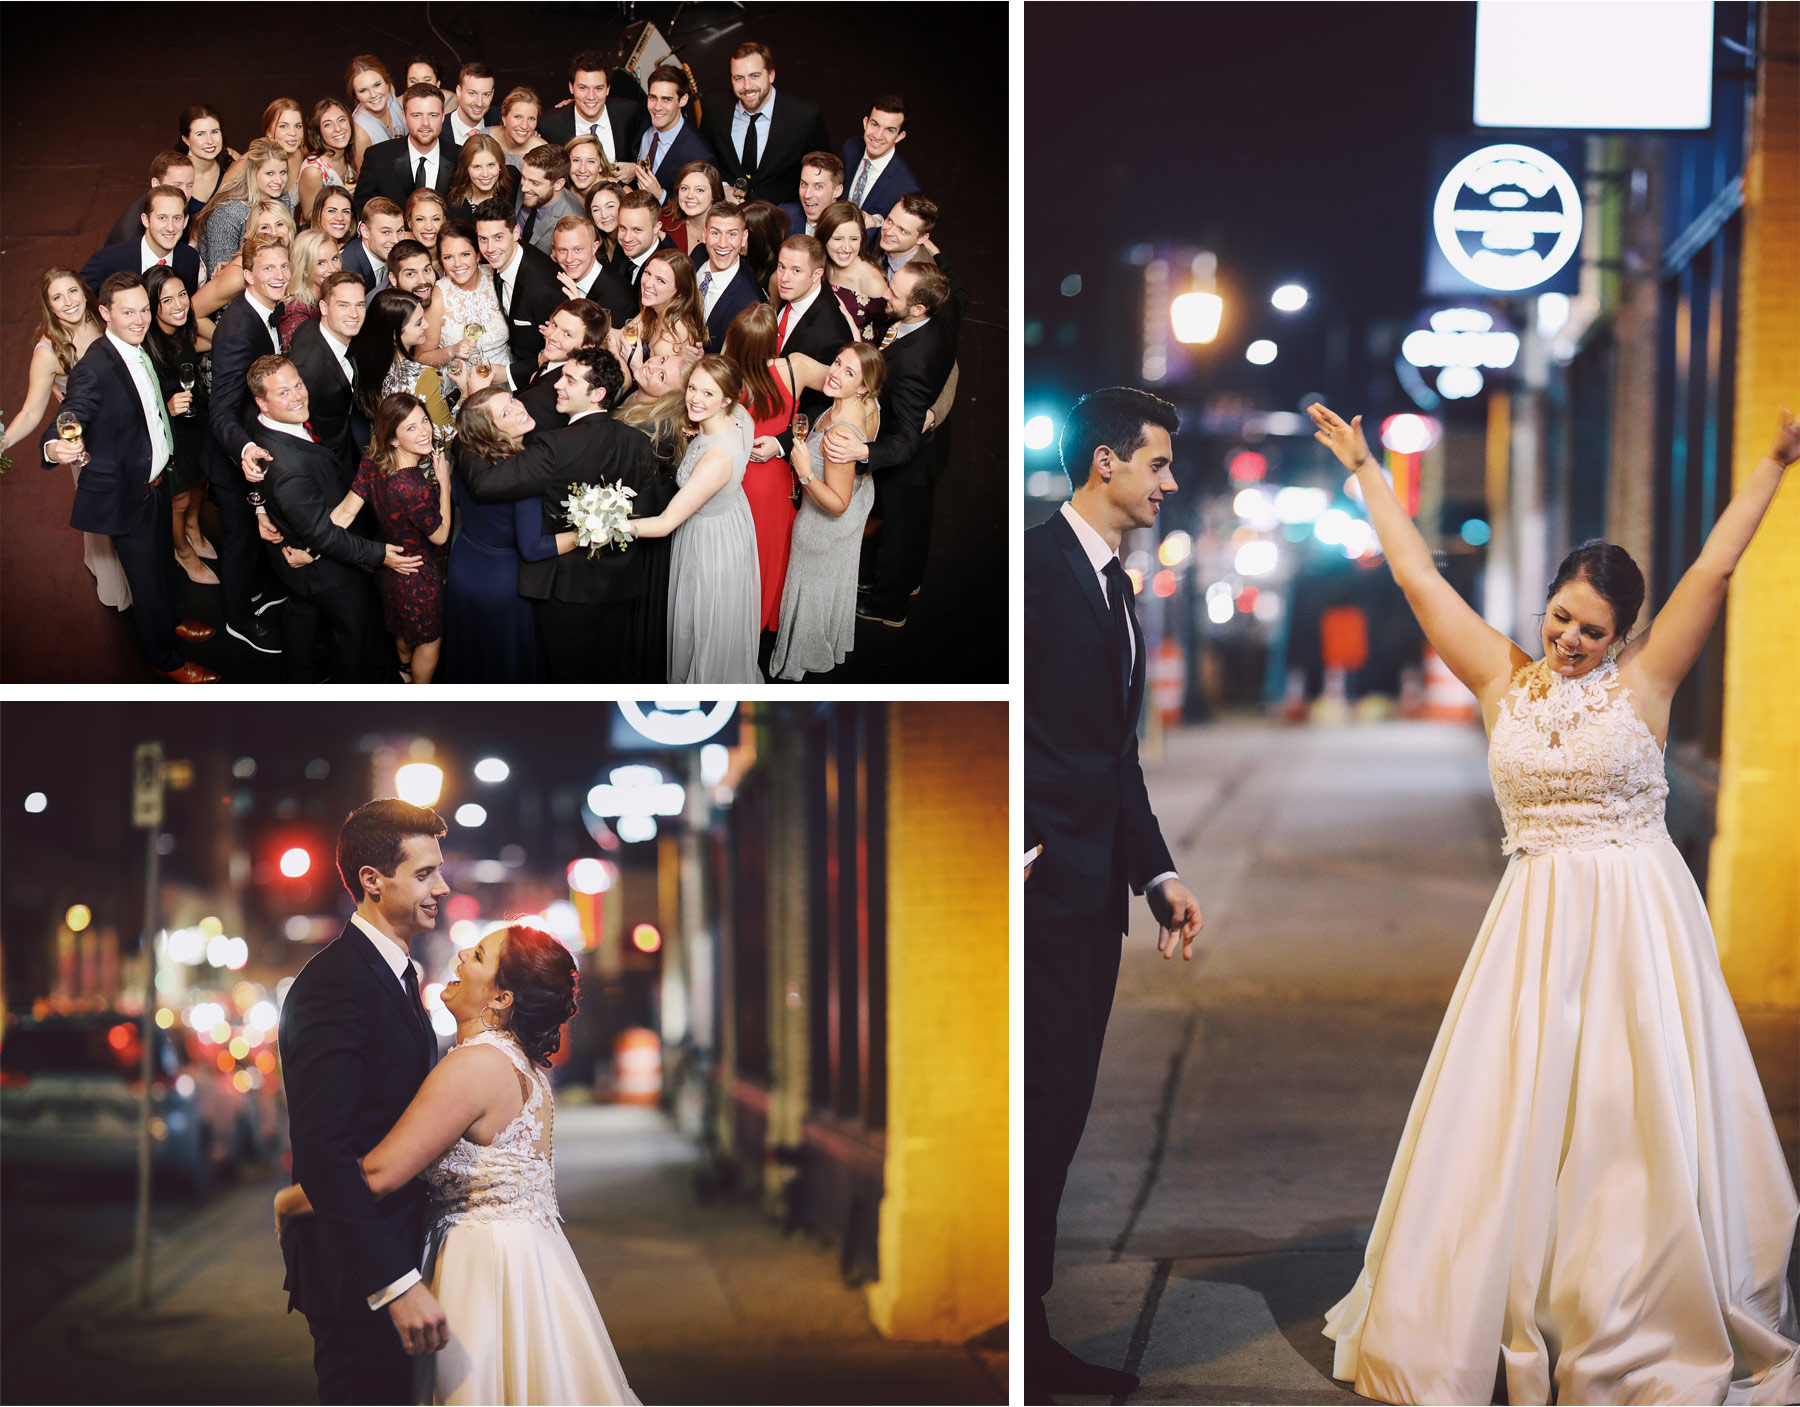 13-Minneapolis-Minnesota-Wedding-Photographer-Vick-Photography-Downtown-Aria-Night-Photography-Carrie-and-August.jpg